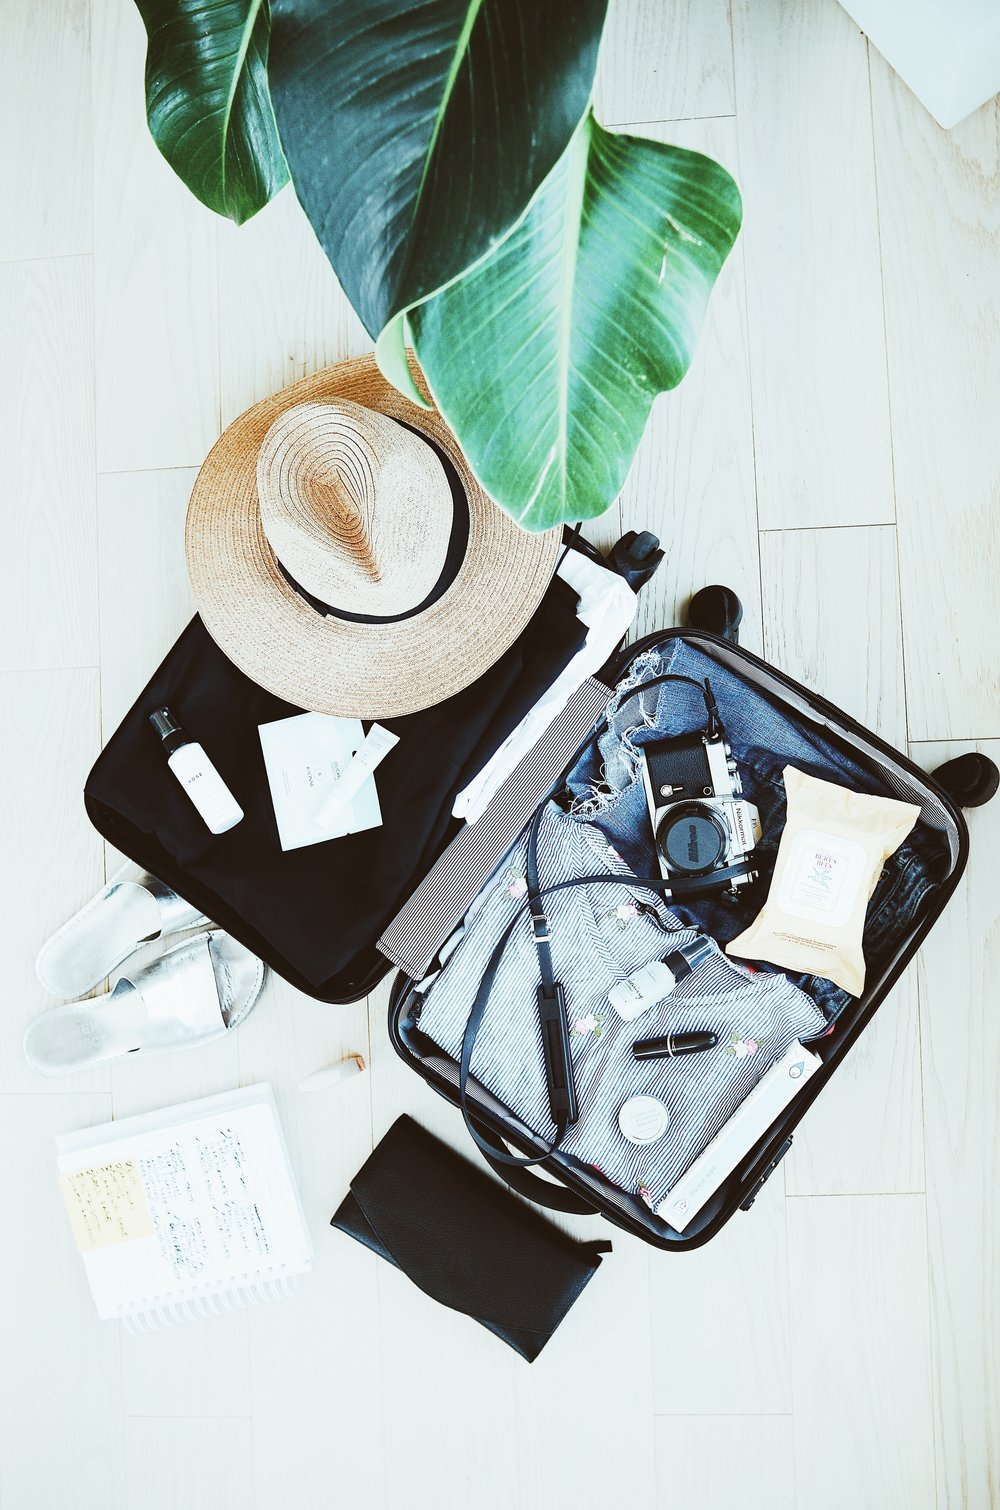 Blog Post Prompts for Summer